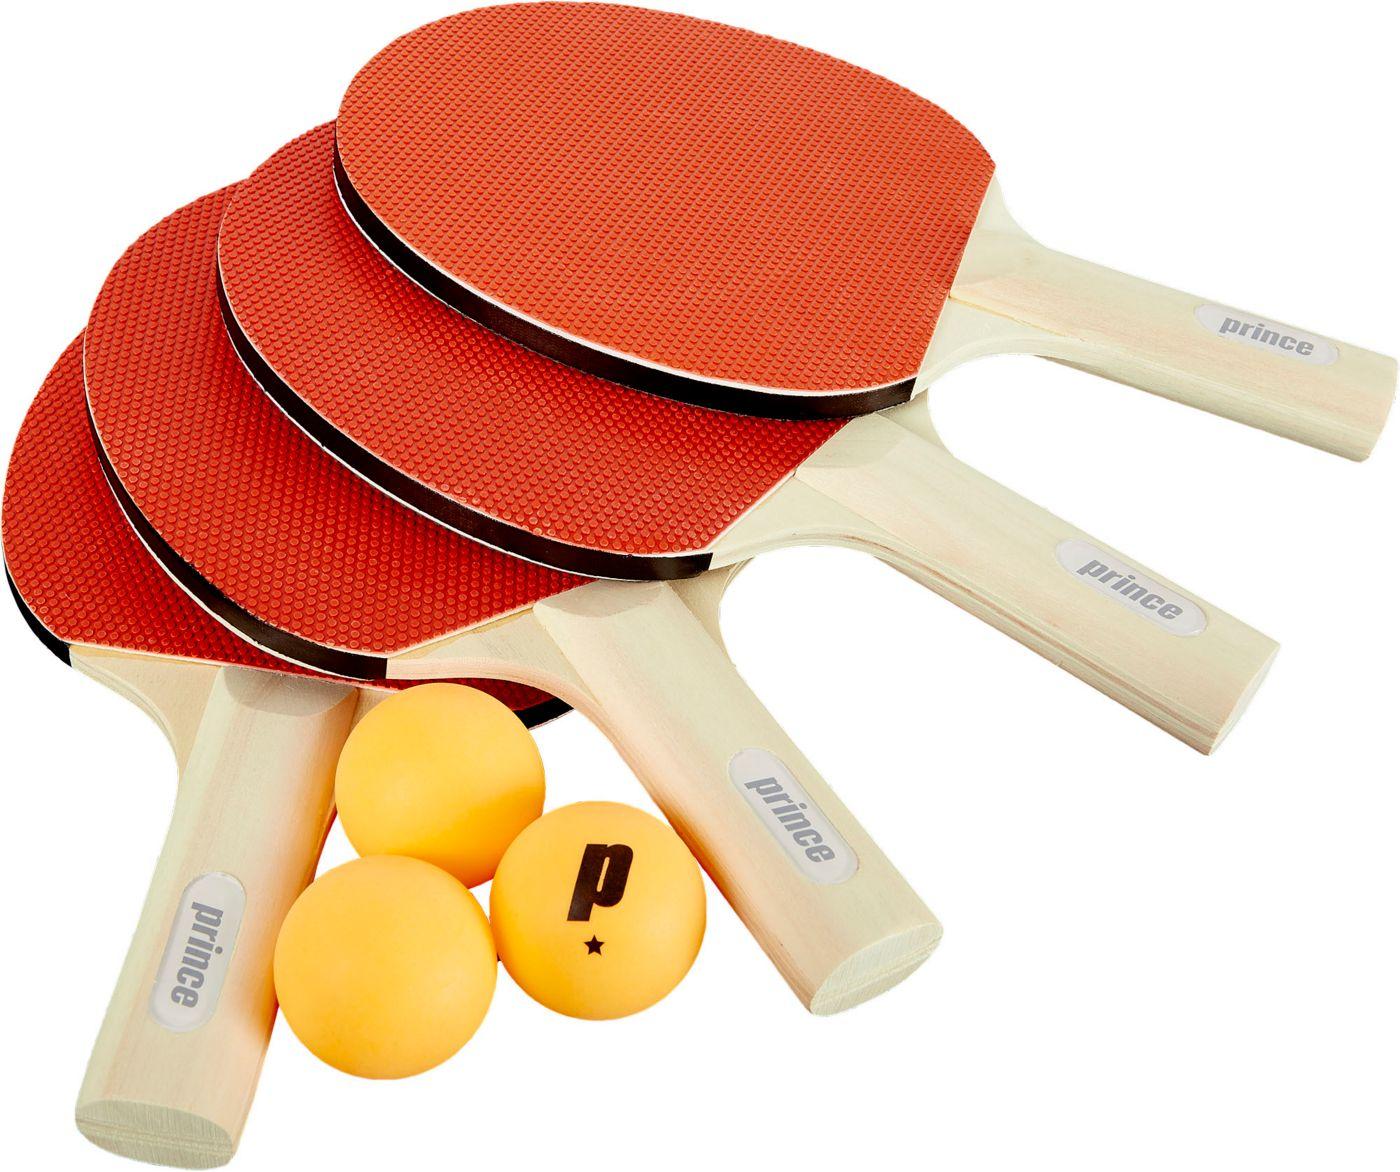 Prince Classic 4-Player Racket Set